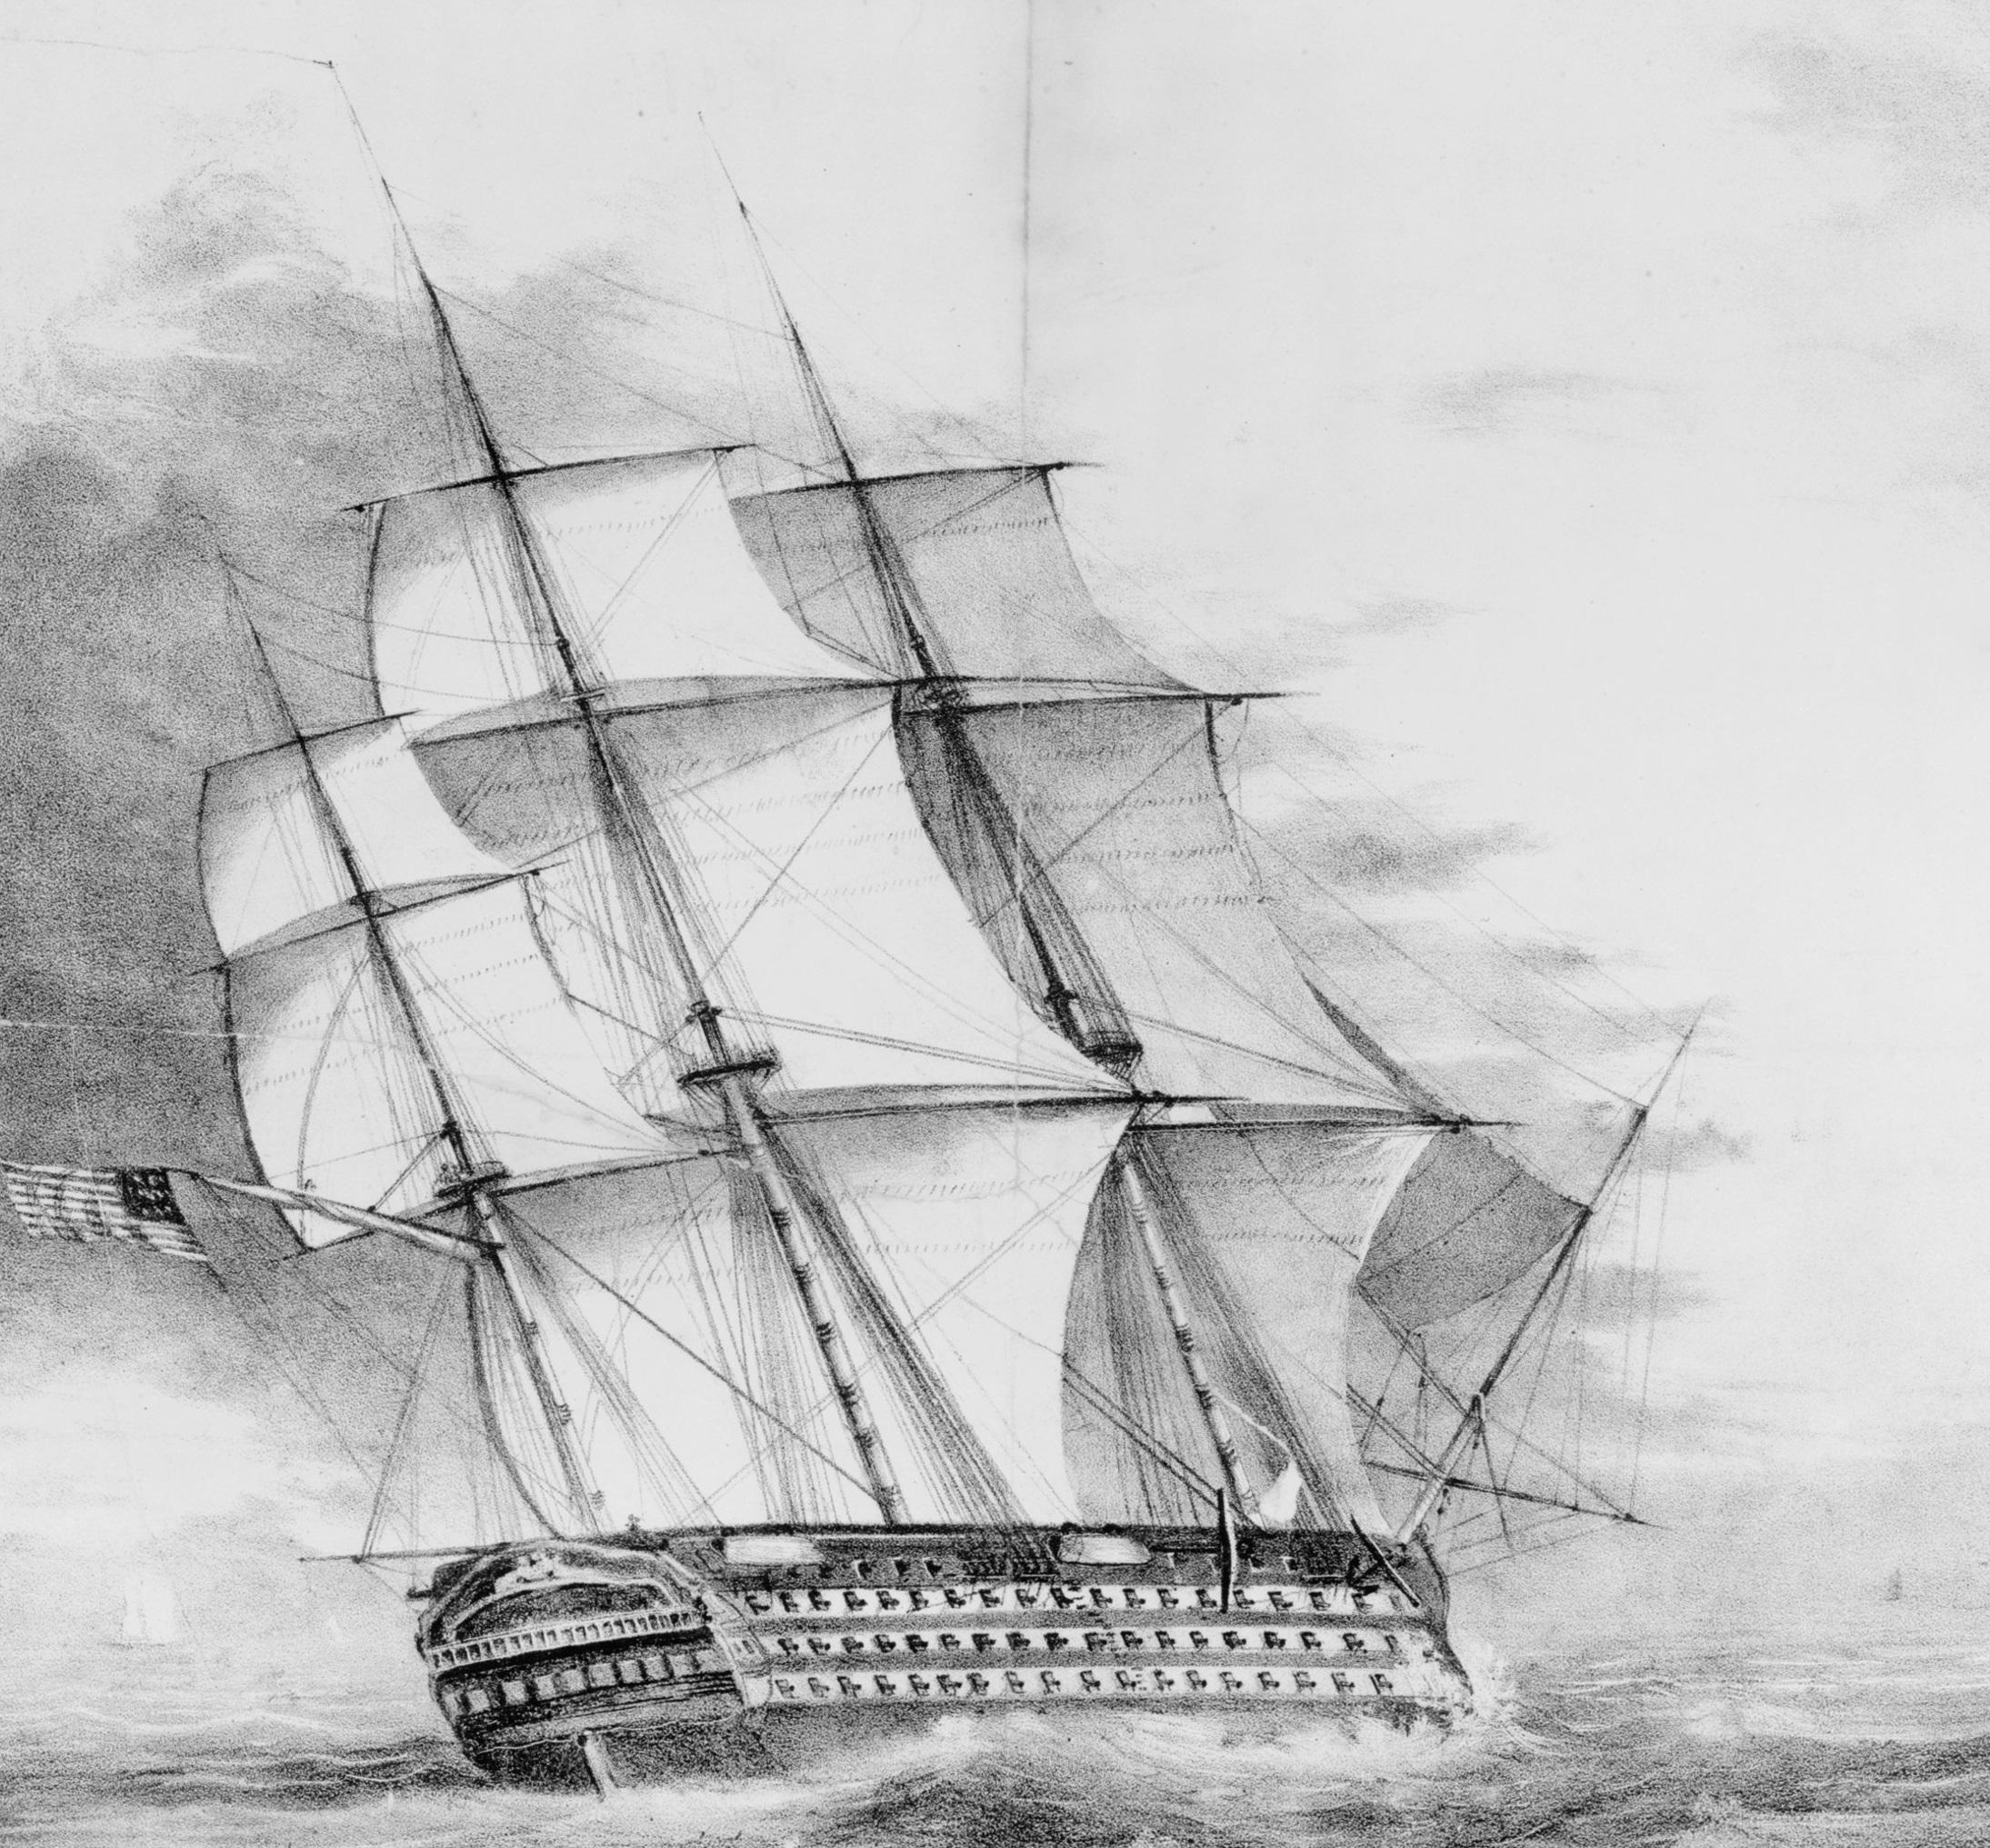 U.S._Ship_Pennsylvania._Charles_Stewart_Esq._Comr_LCCN2004666063